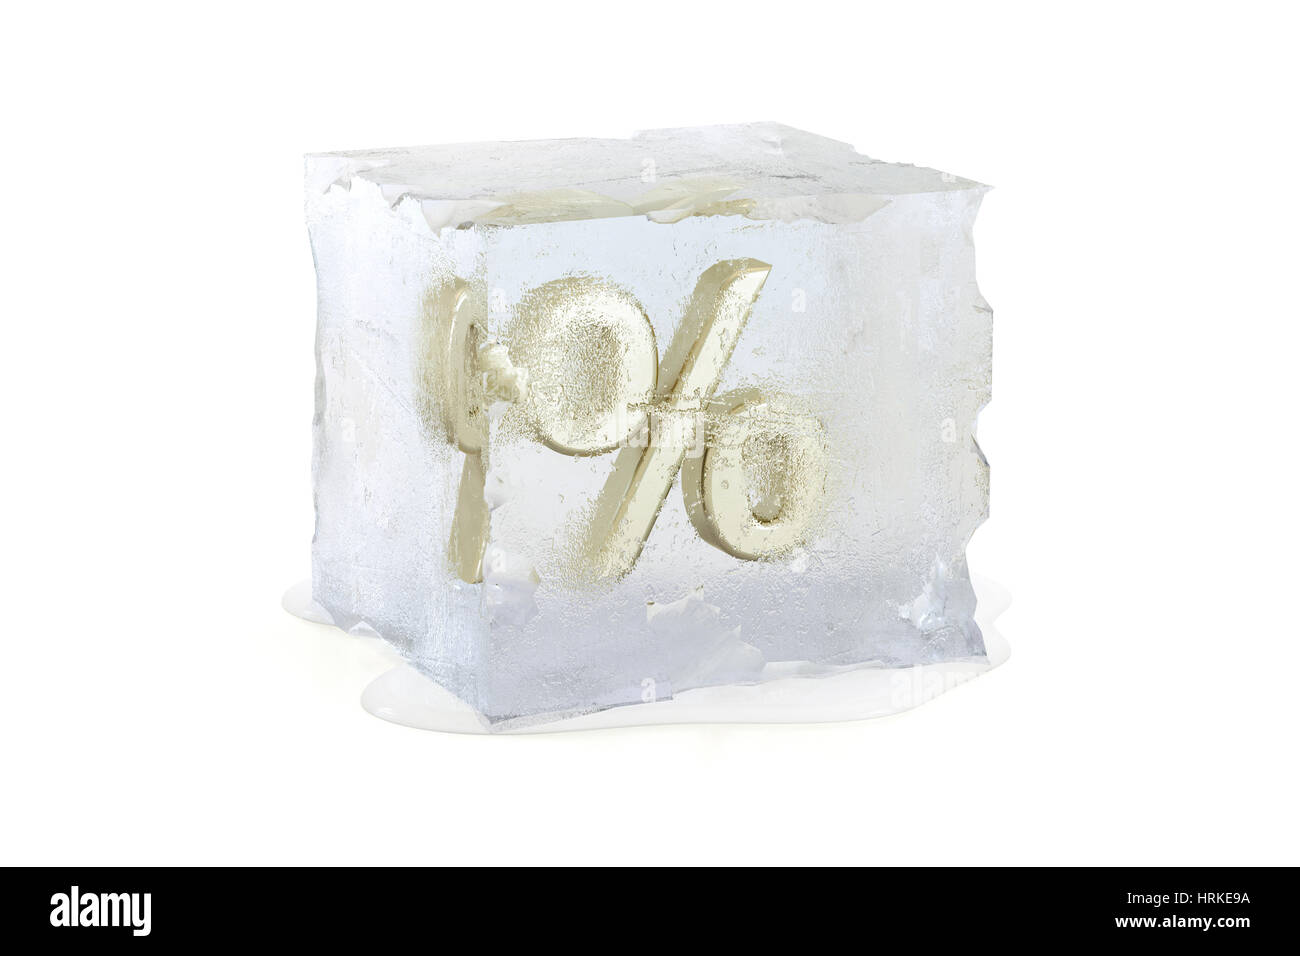 Prozentsatz Symbol in einem langsam schmelzen Ice Cube - Zinssatz freeze Konzept eingefroren Stockbild